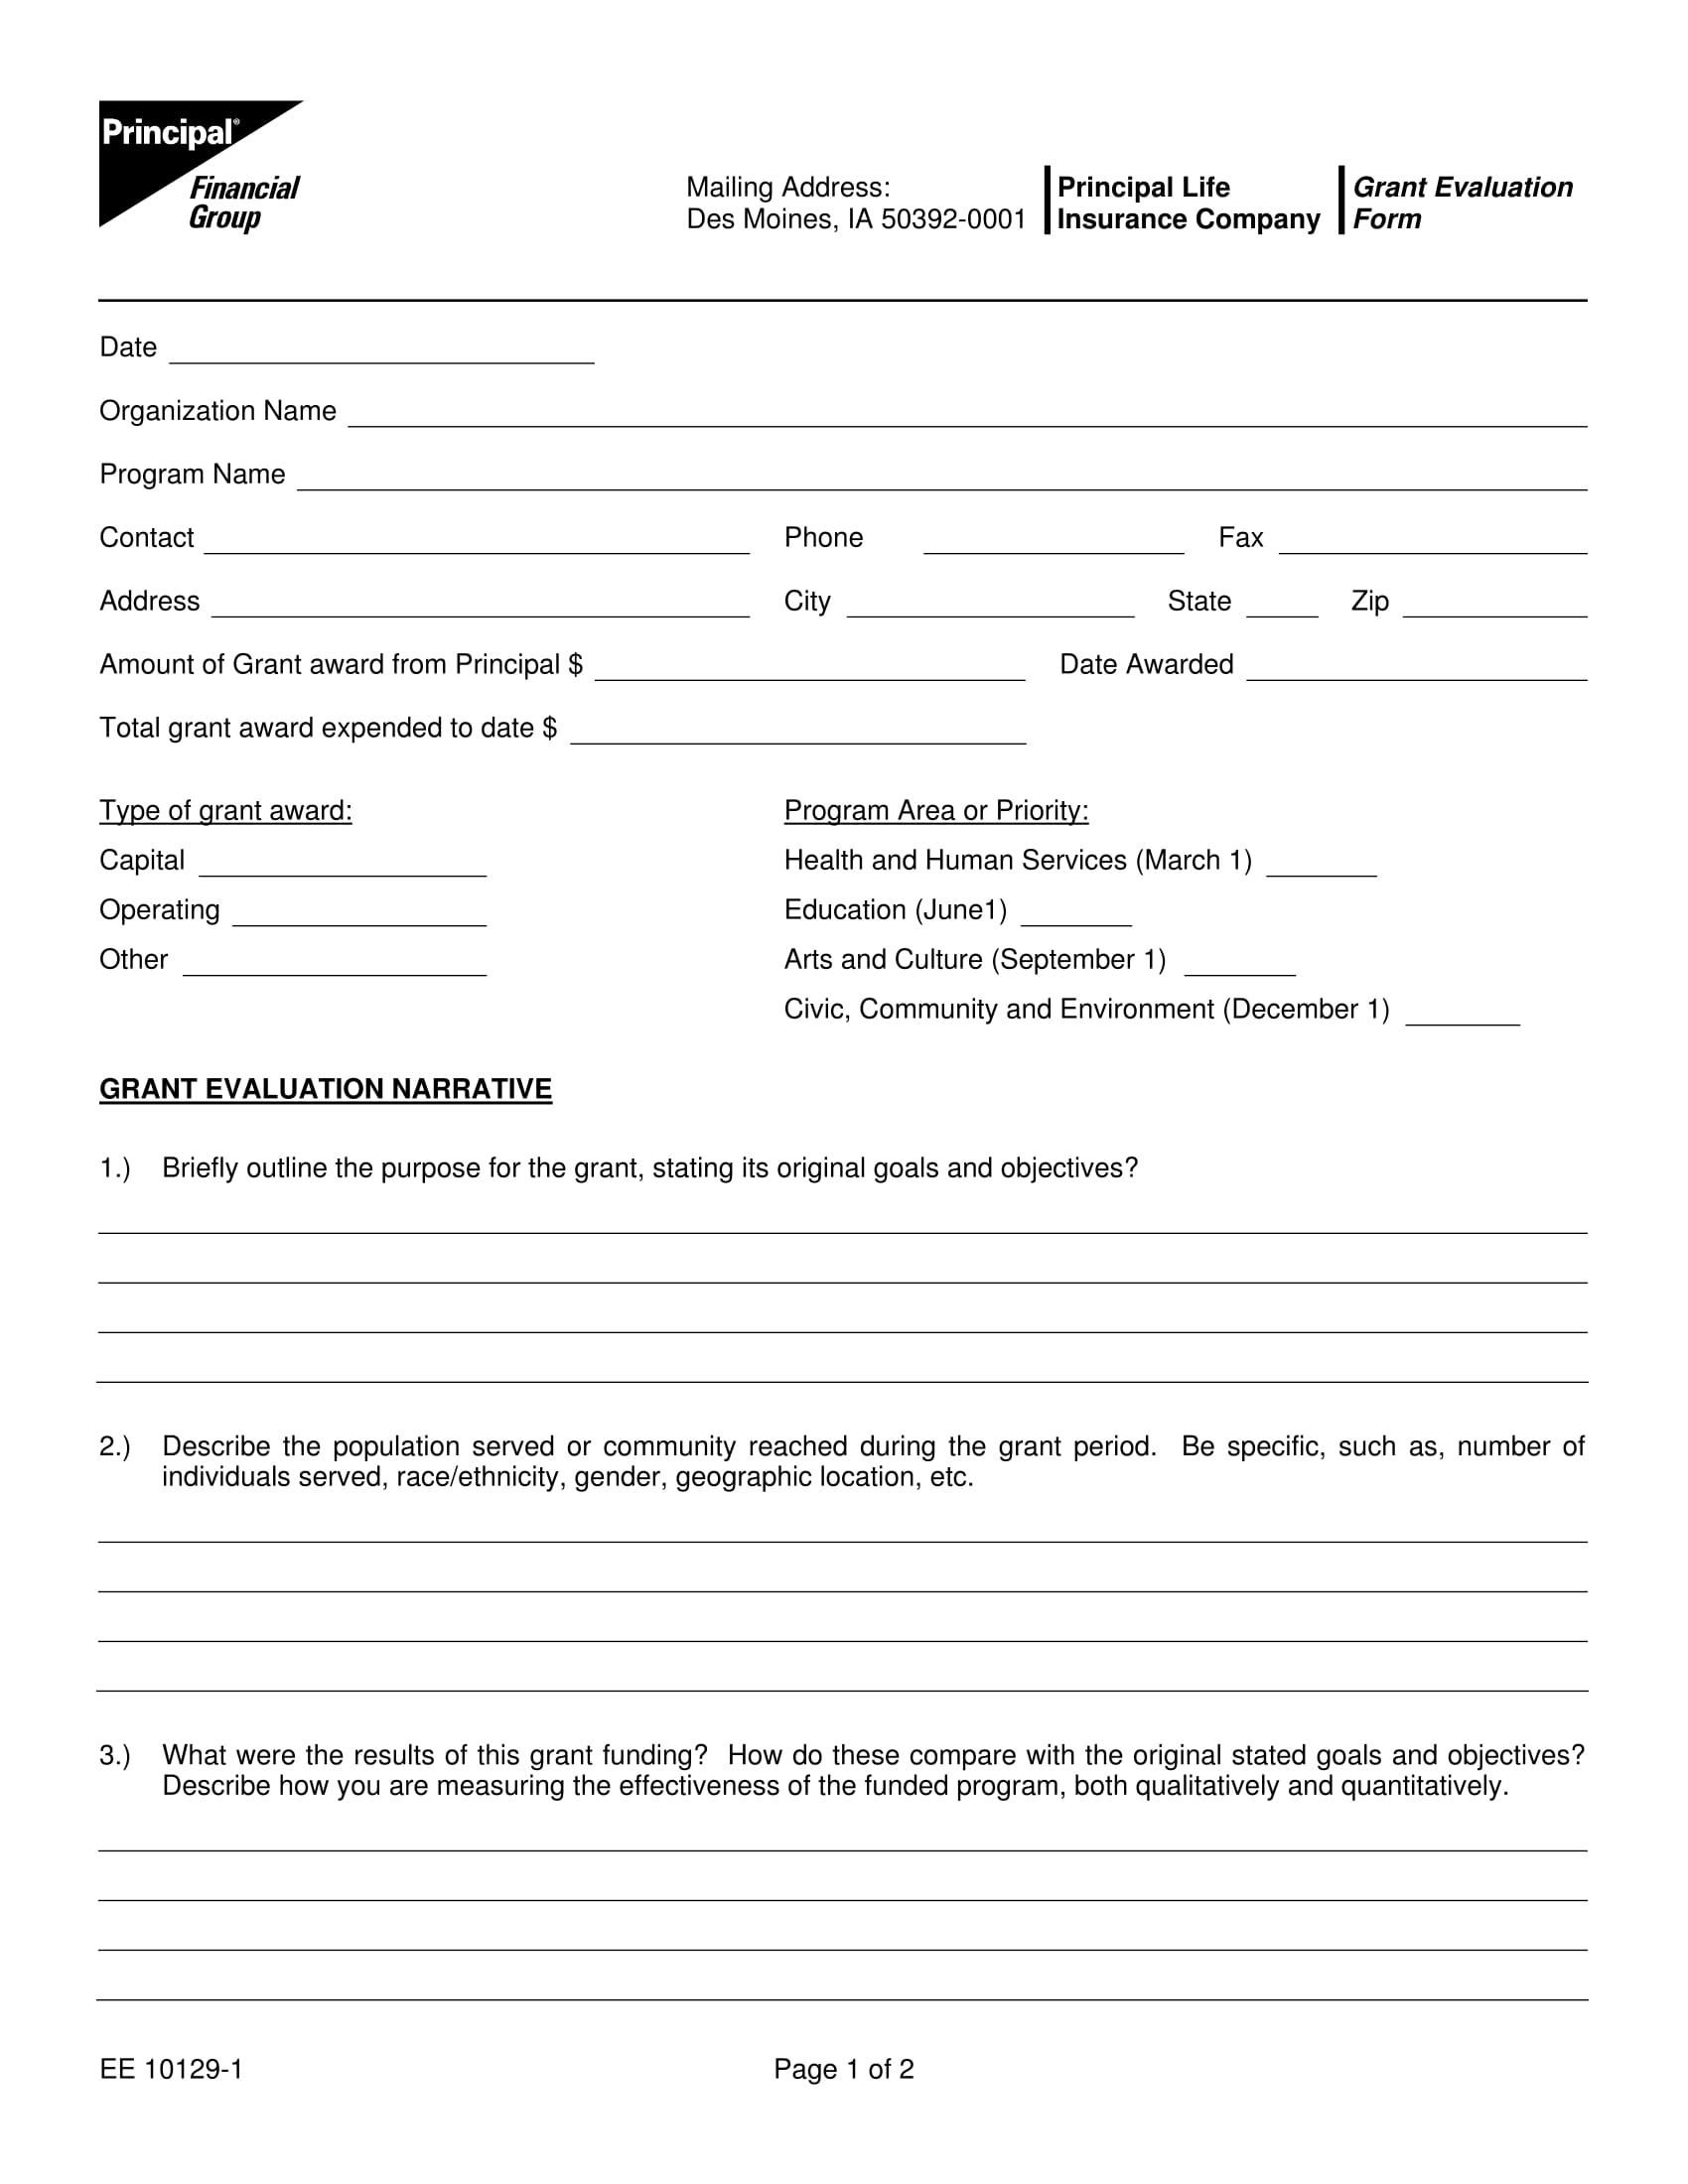 insurance grant evaluation form 1